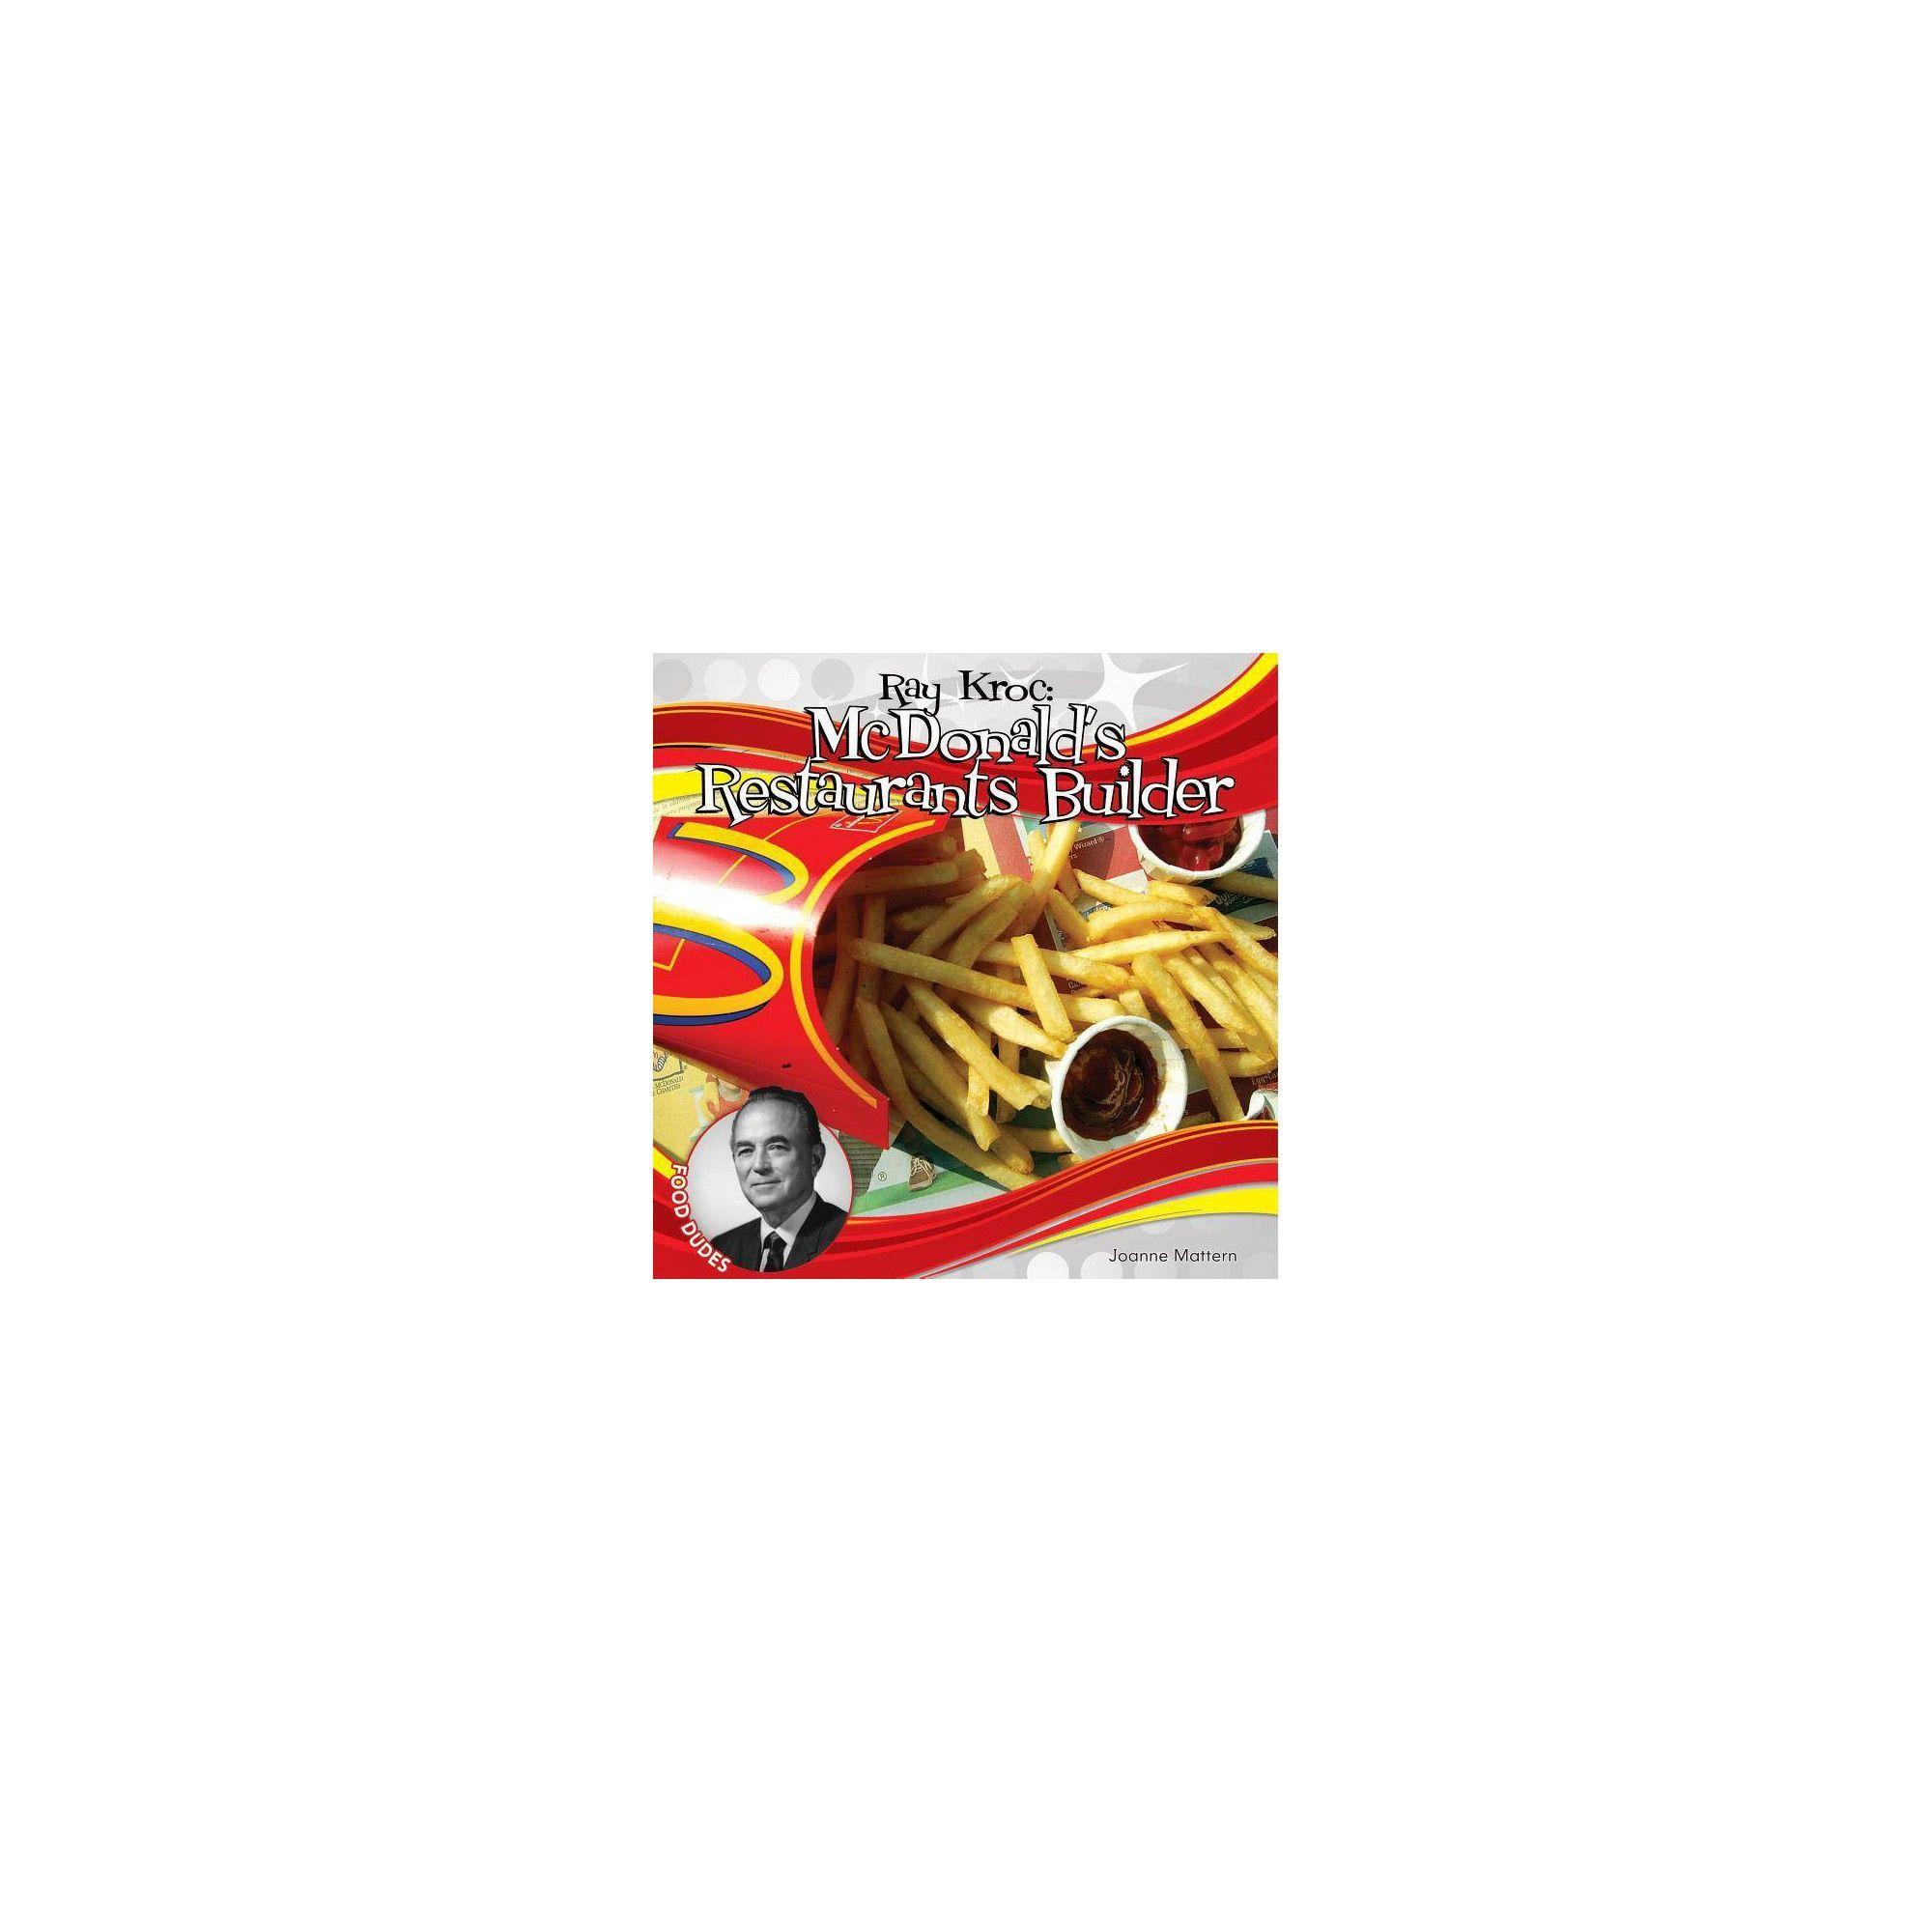 Ray Kroc McDonald's Restaurants Builder (Food Dudes) by